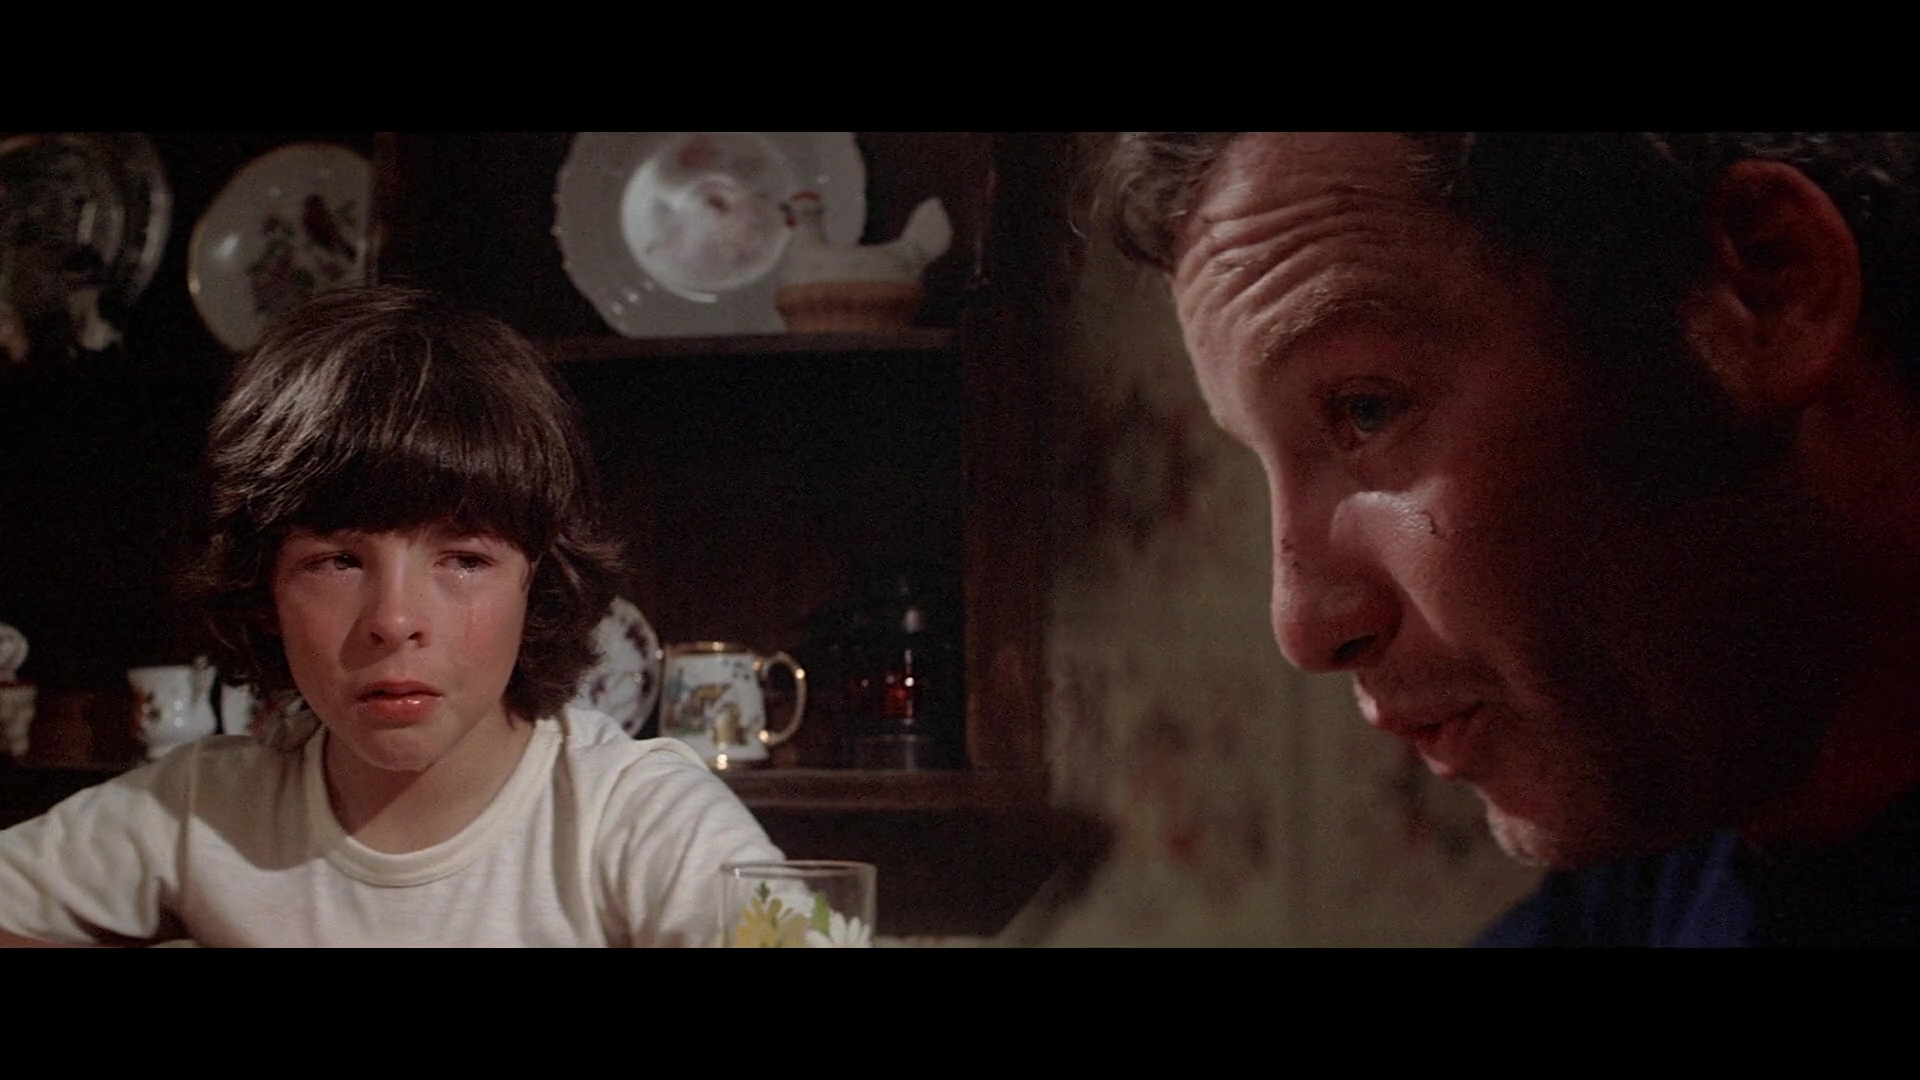 Encuentros Cercanos Del Tercer Tipo 1080p Lat-Cast-Ing 5.1 (1977)